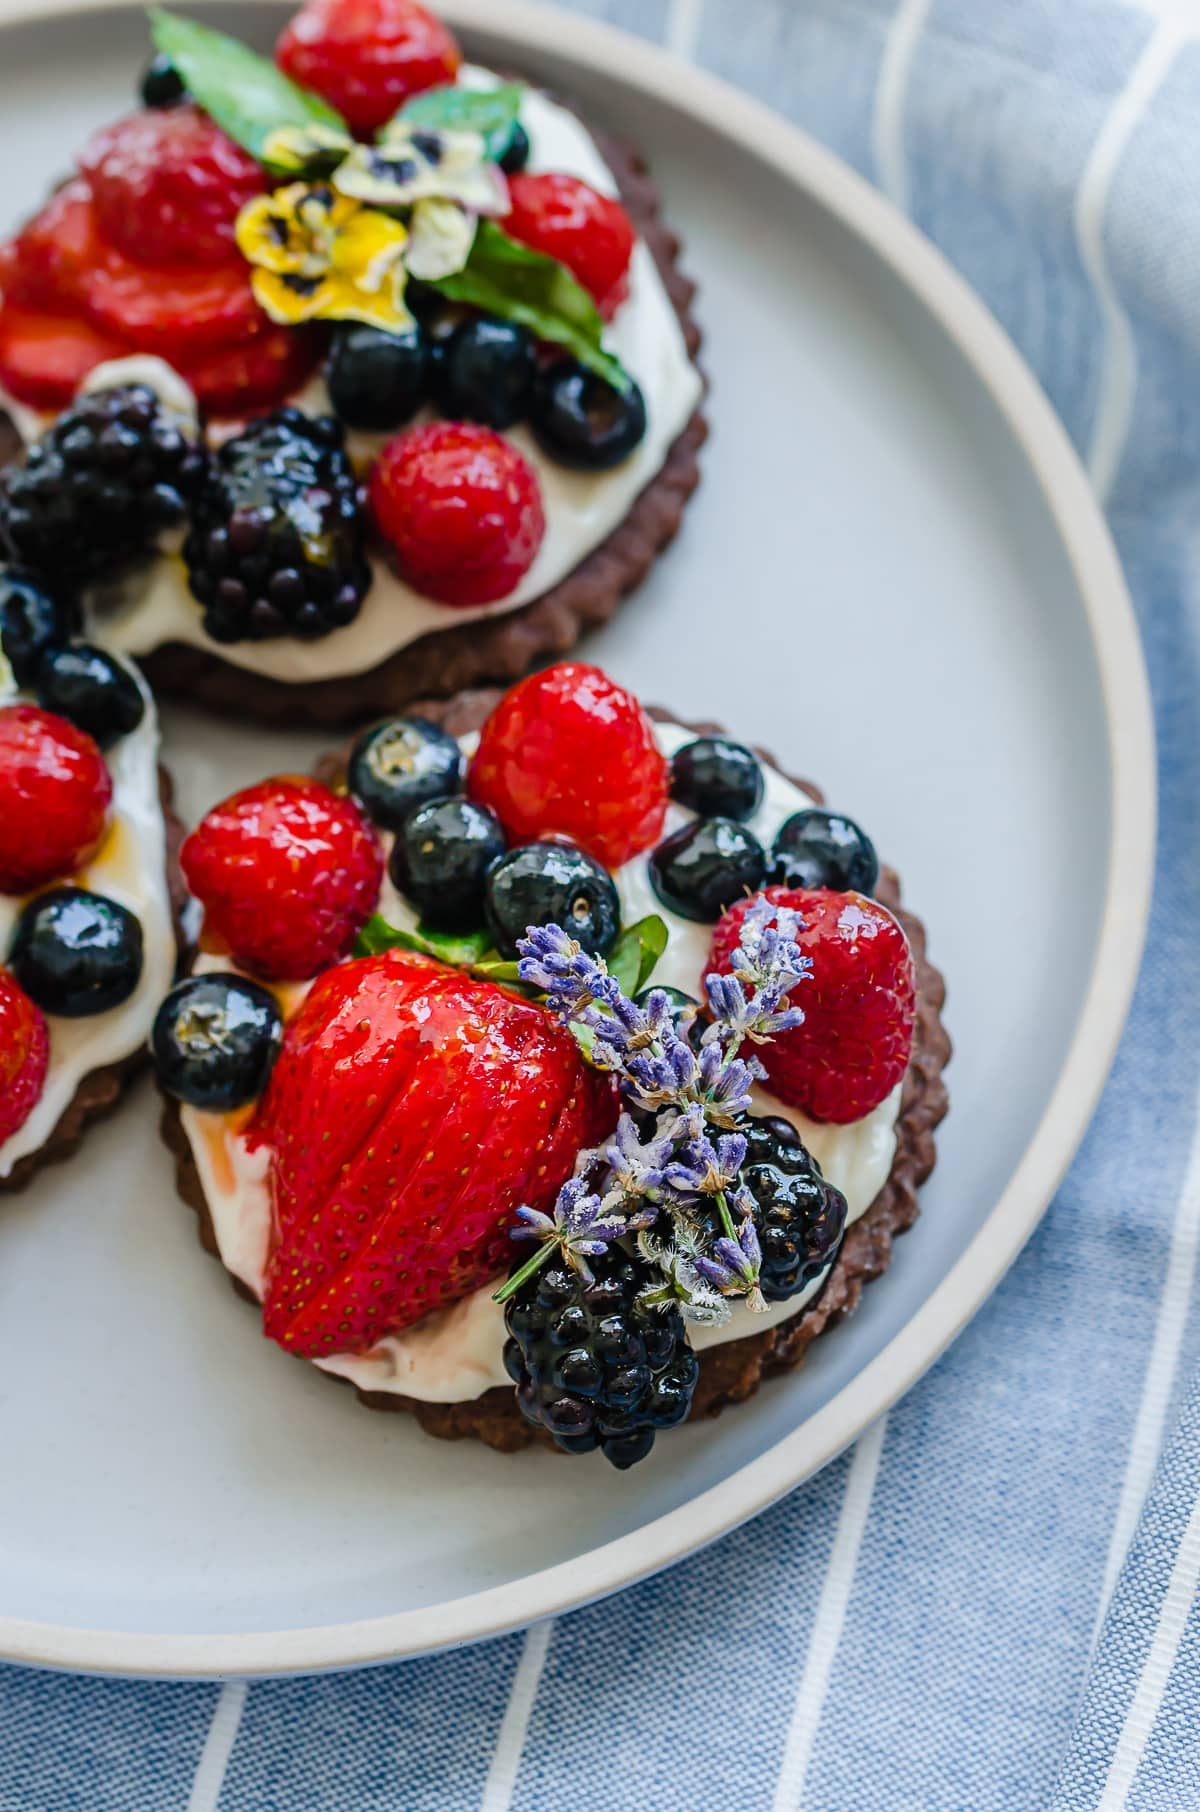 Side shot of a chocolate mini fruit tart on a blue plate.